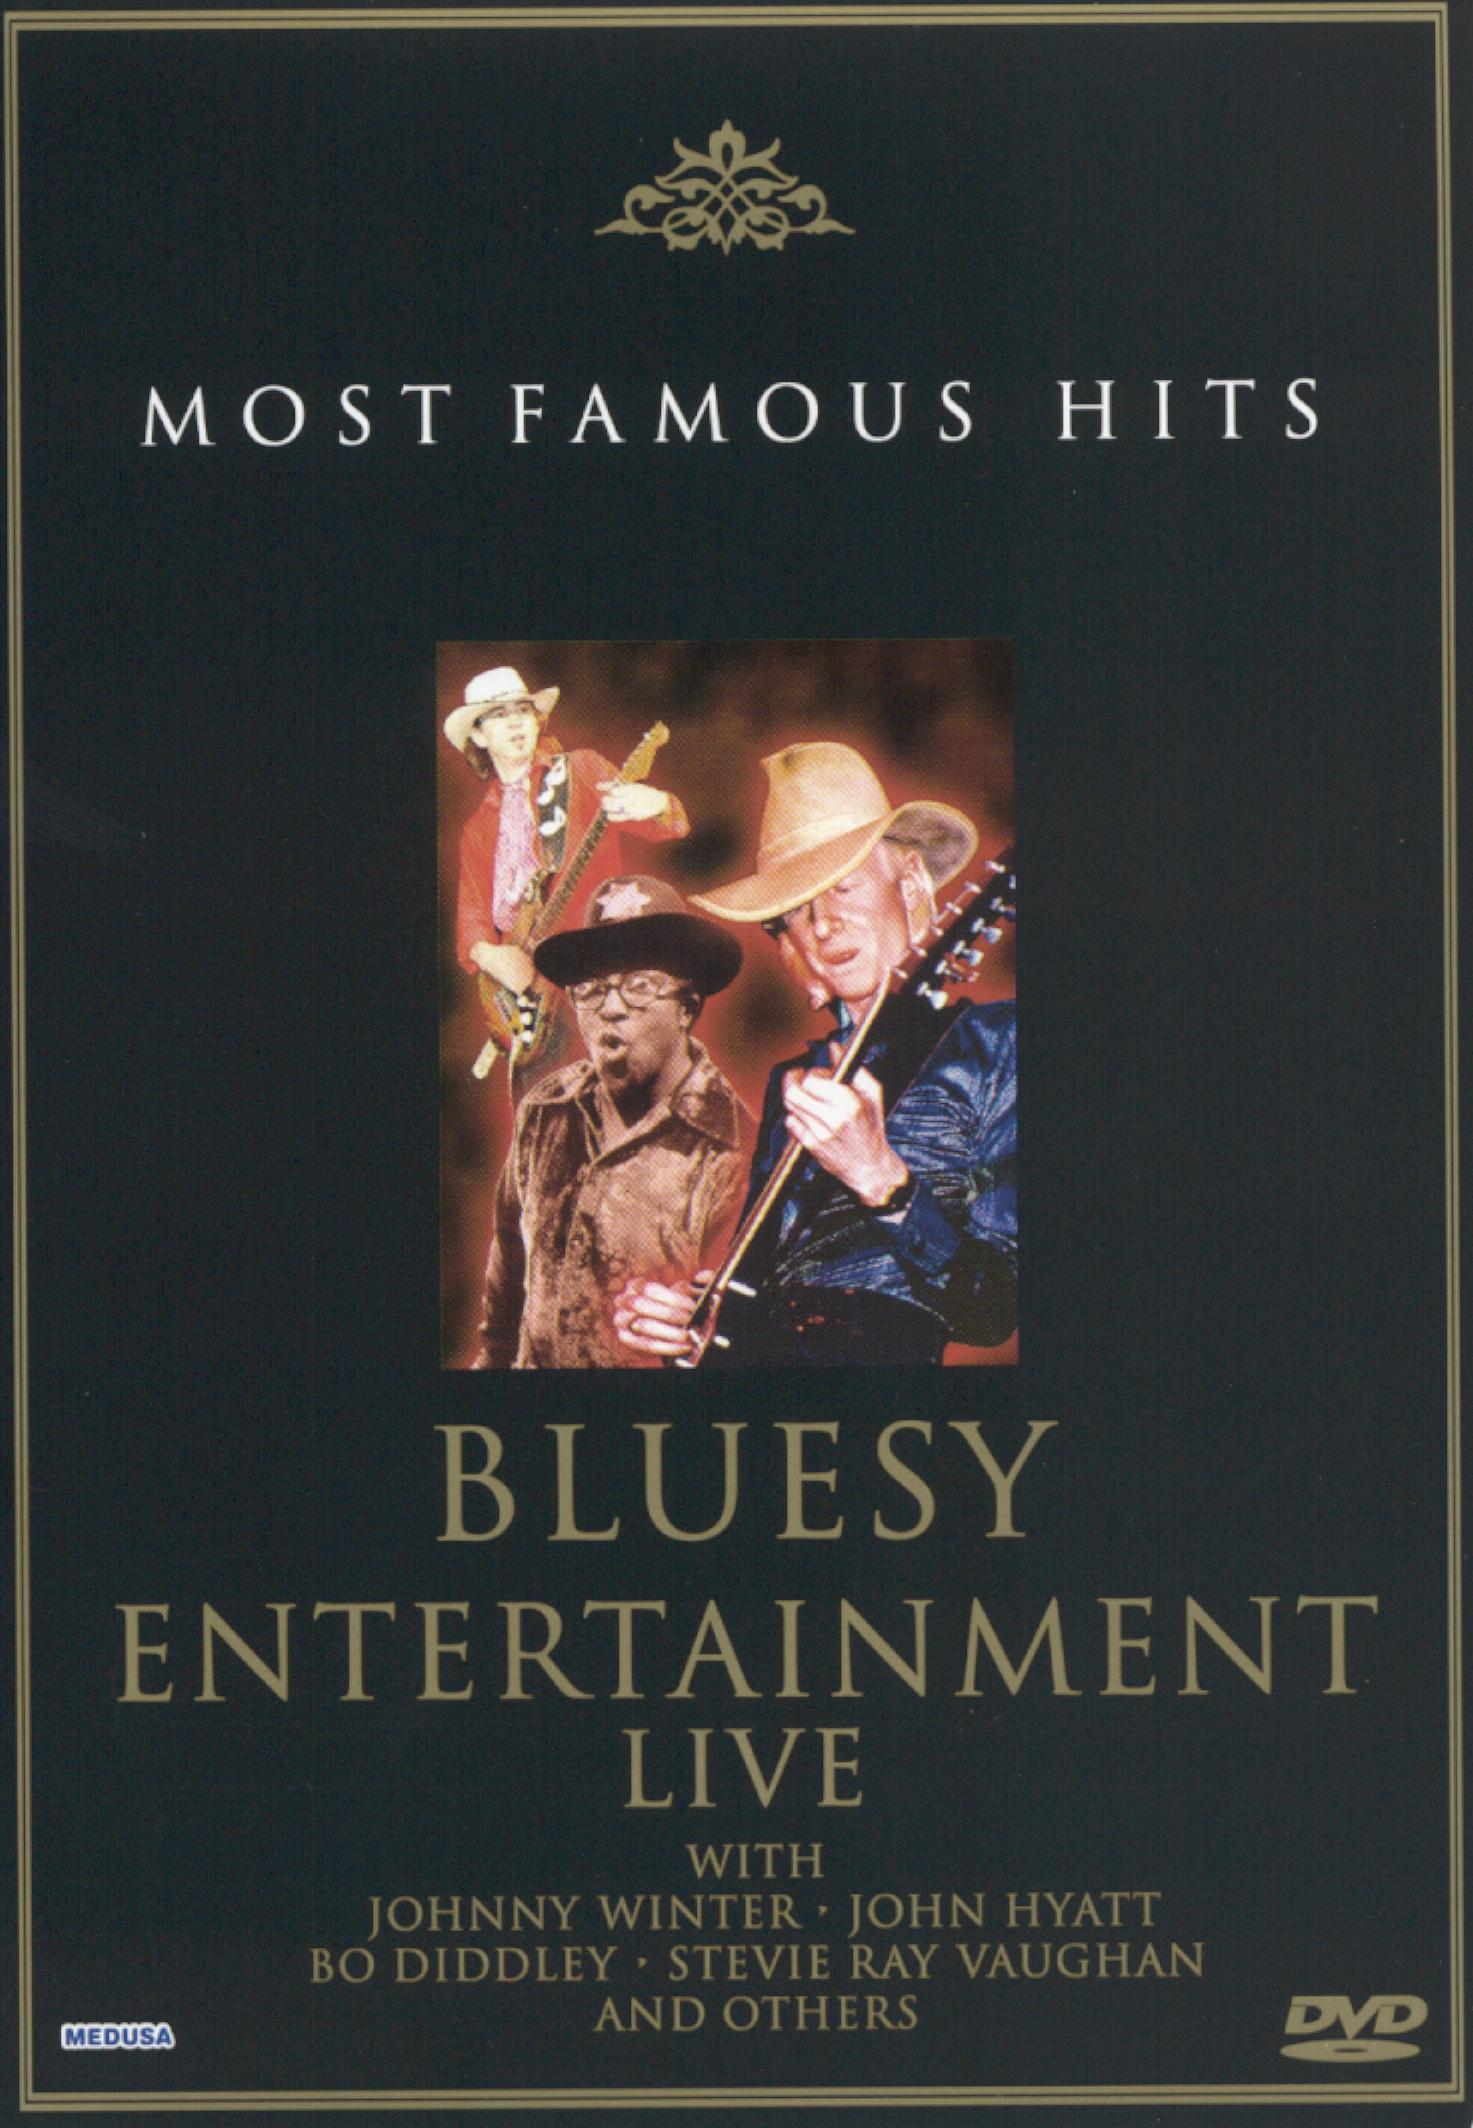 Most Famous Hits: Bluesy Entertainment - Live